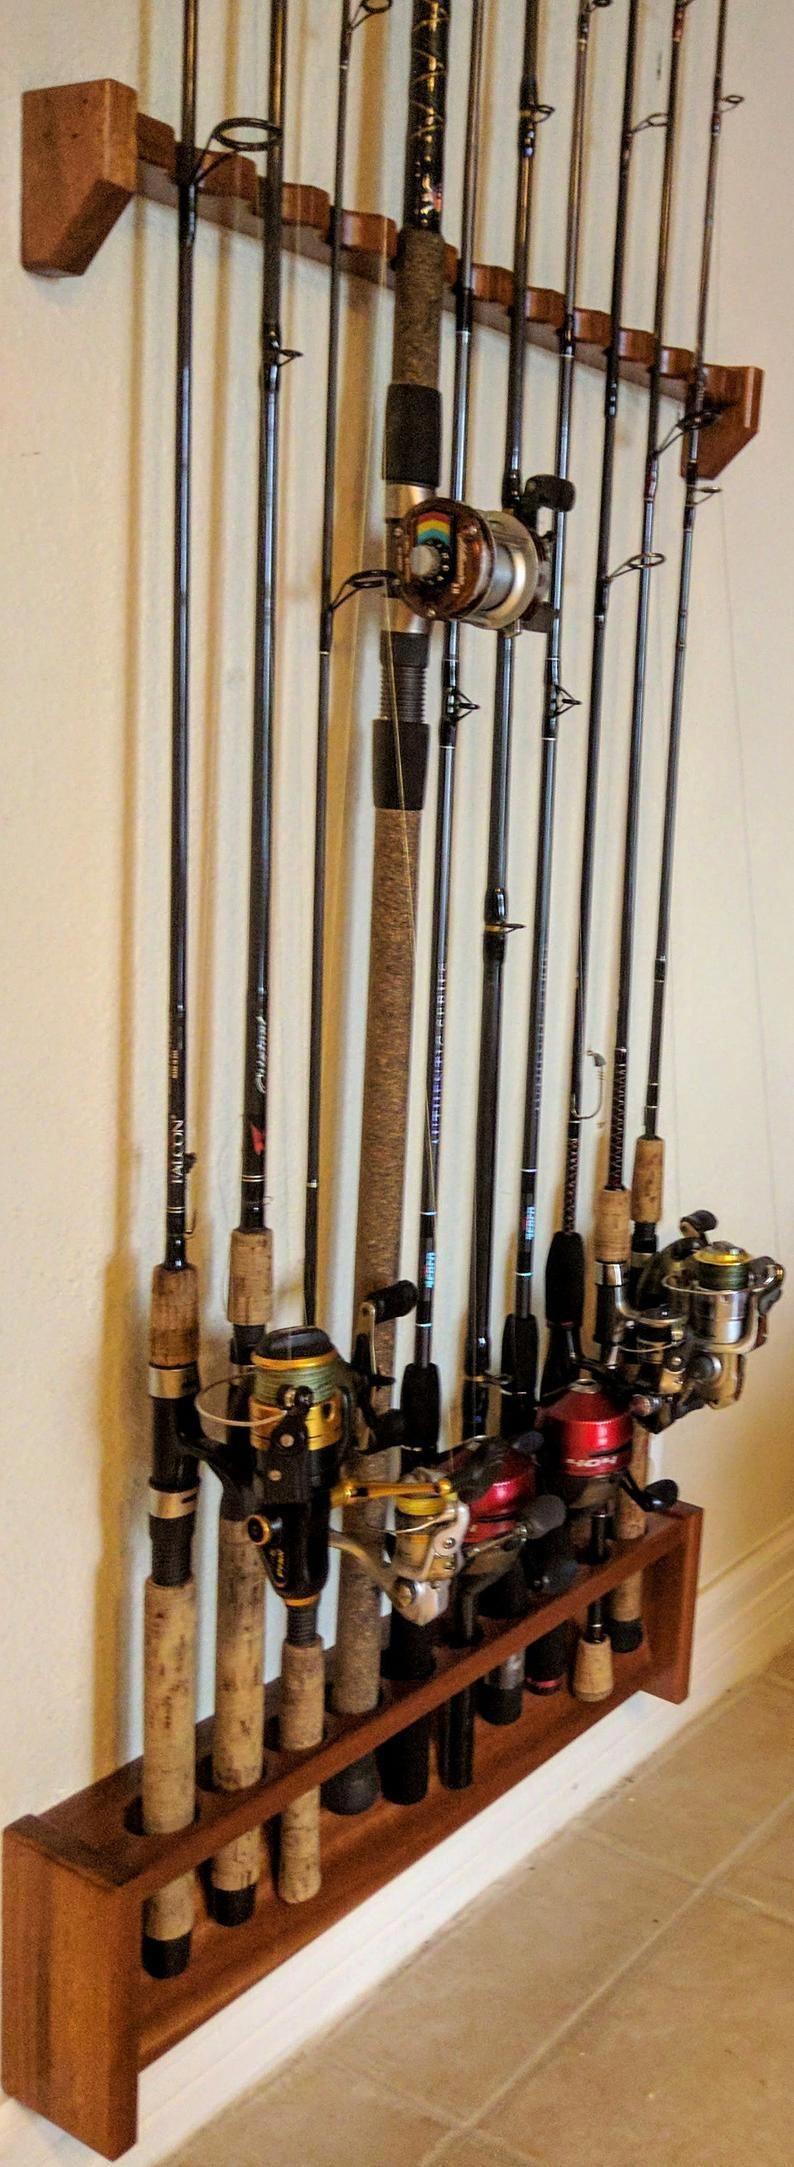 Fishing Rod Holder Wall Mount Horizontal Storage Organizer Holds Up to 8 Durable